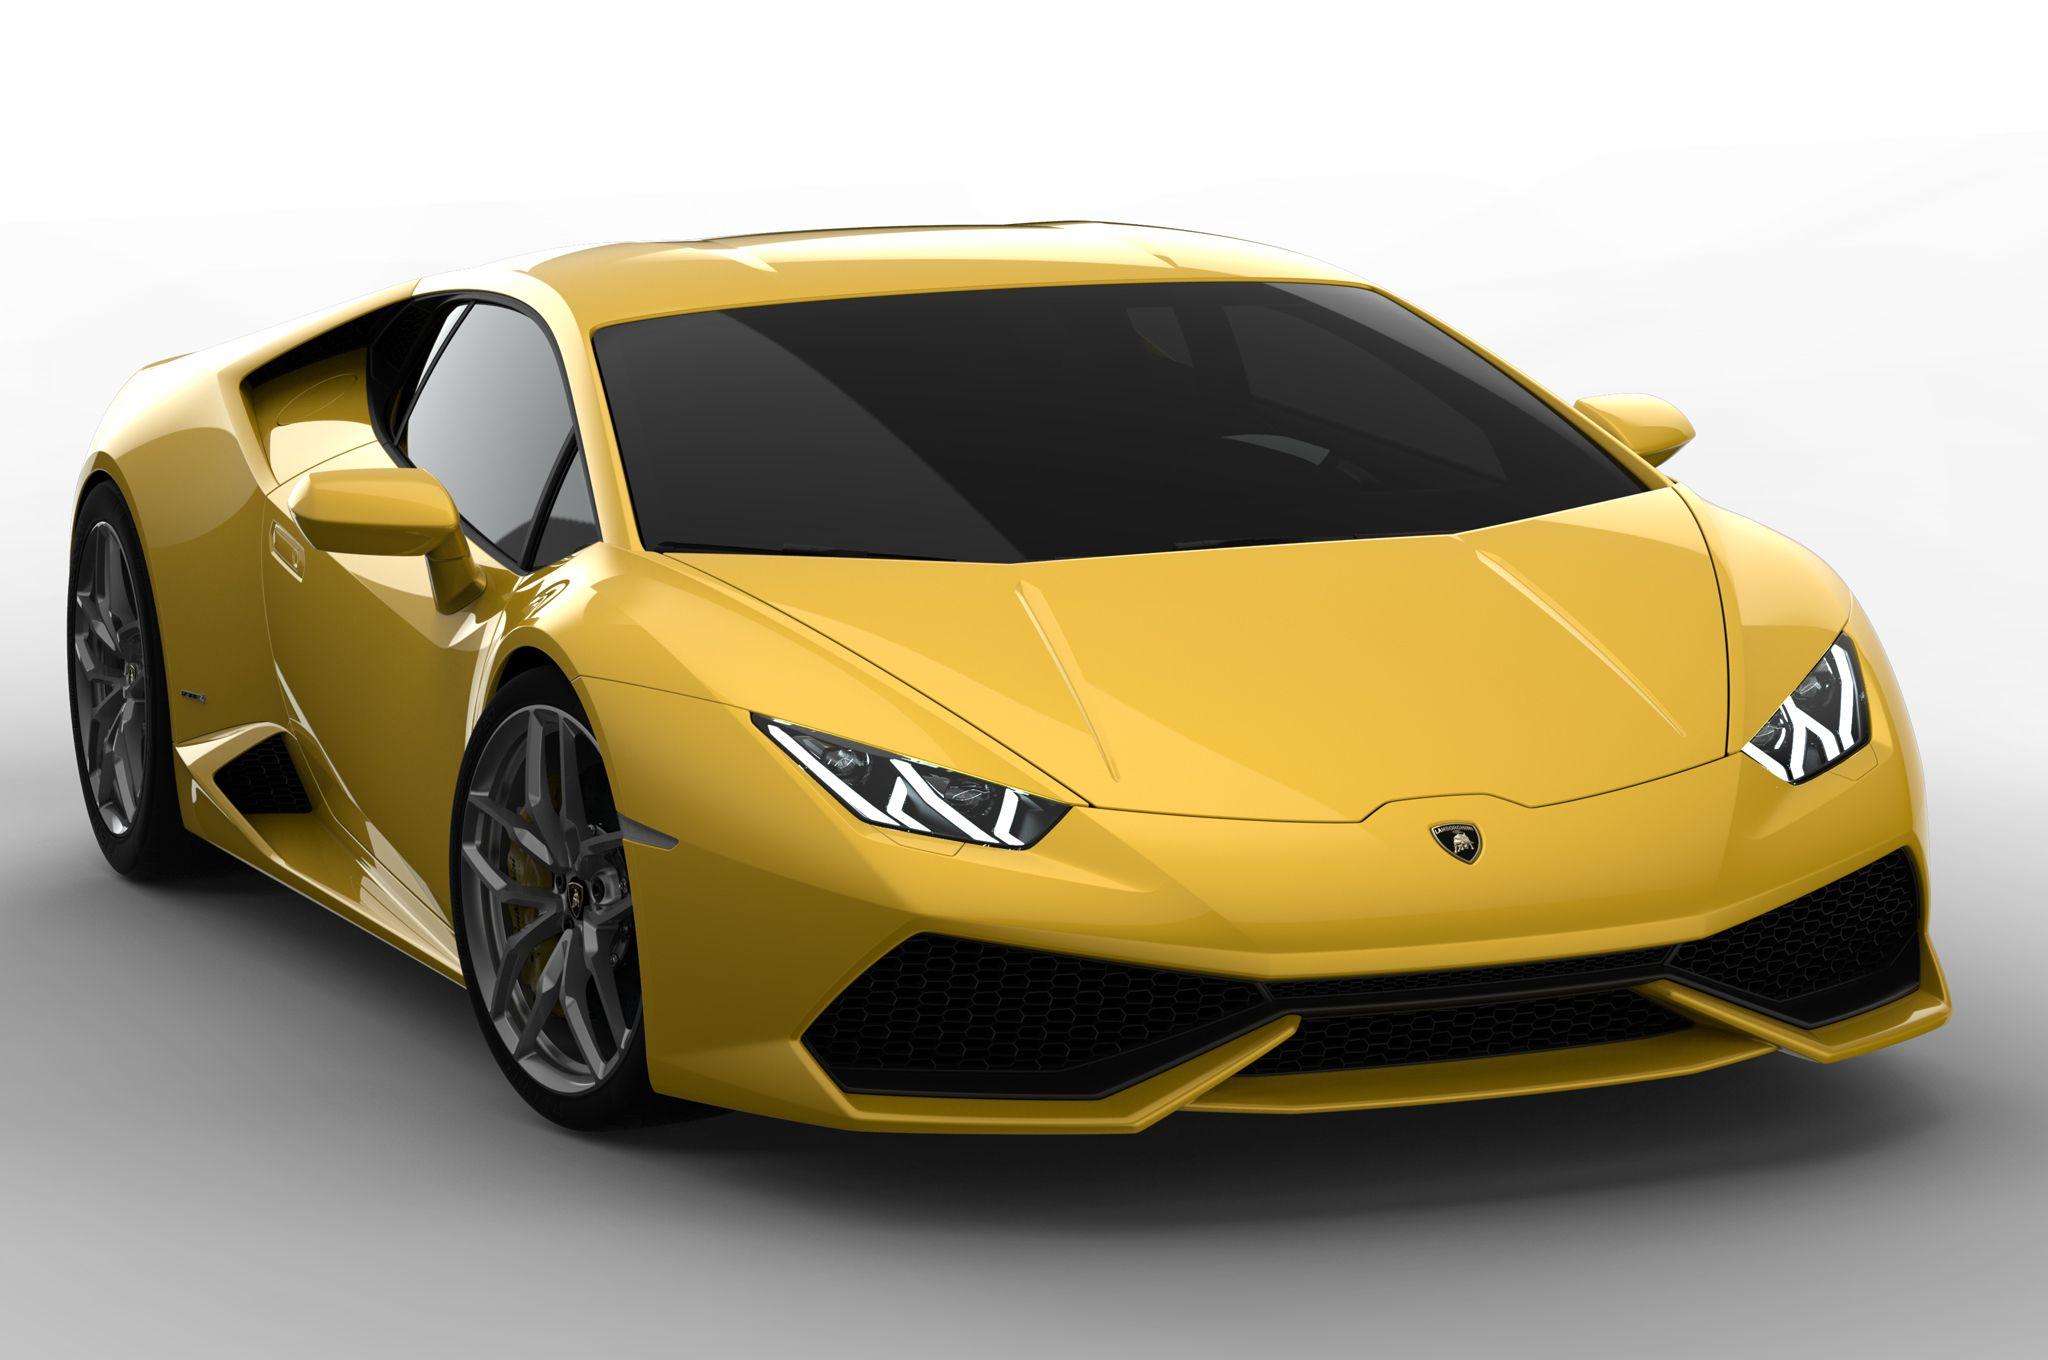 Lamborghini Huracan Lp610 5 2l V10 Lamborghini Huracan Lamborghini Cars Super Sport Cars